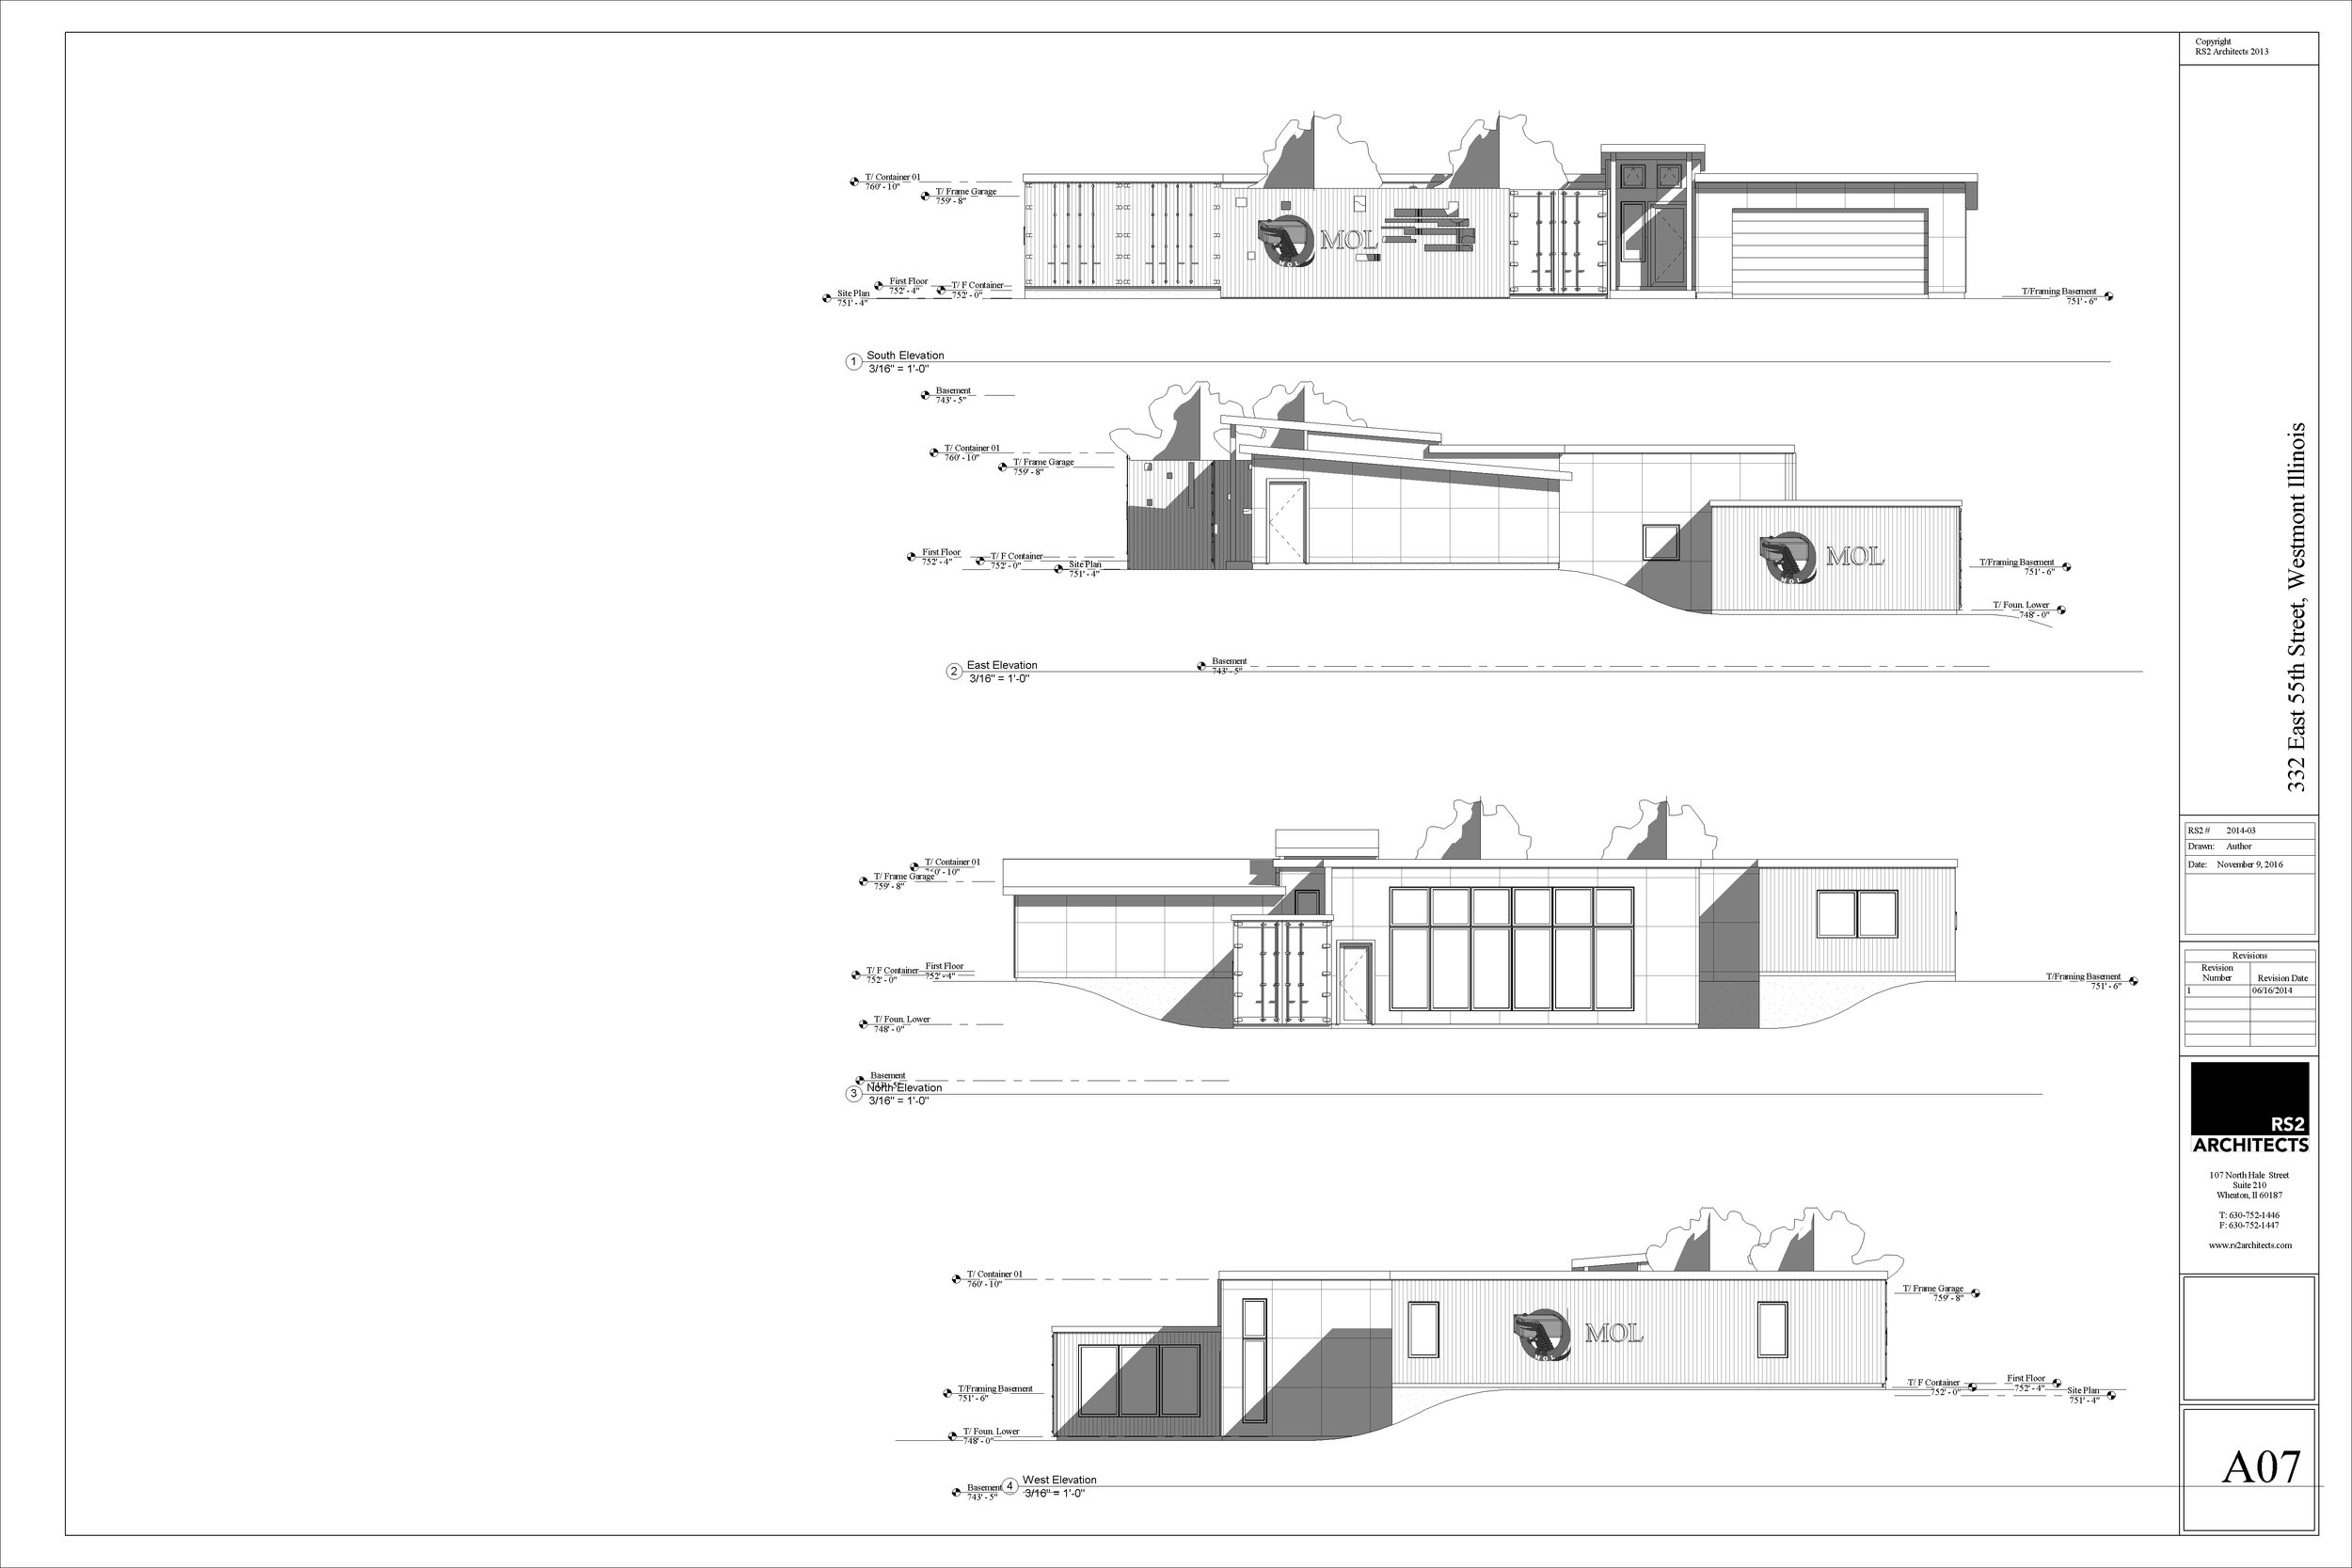 Knapik elevations01.jpg